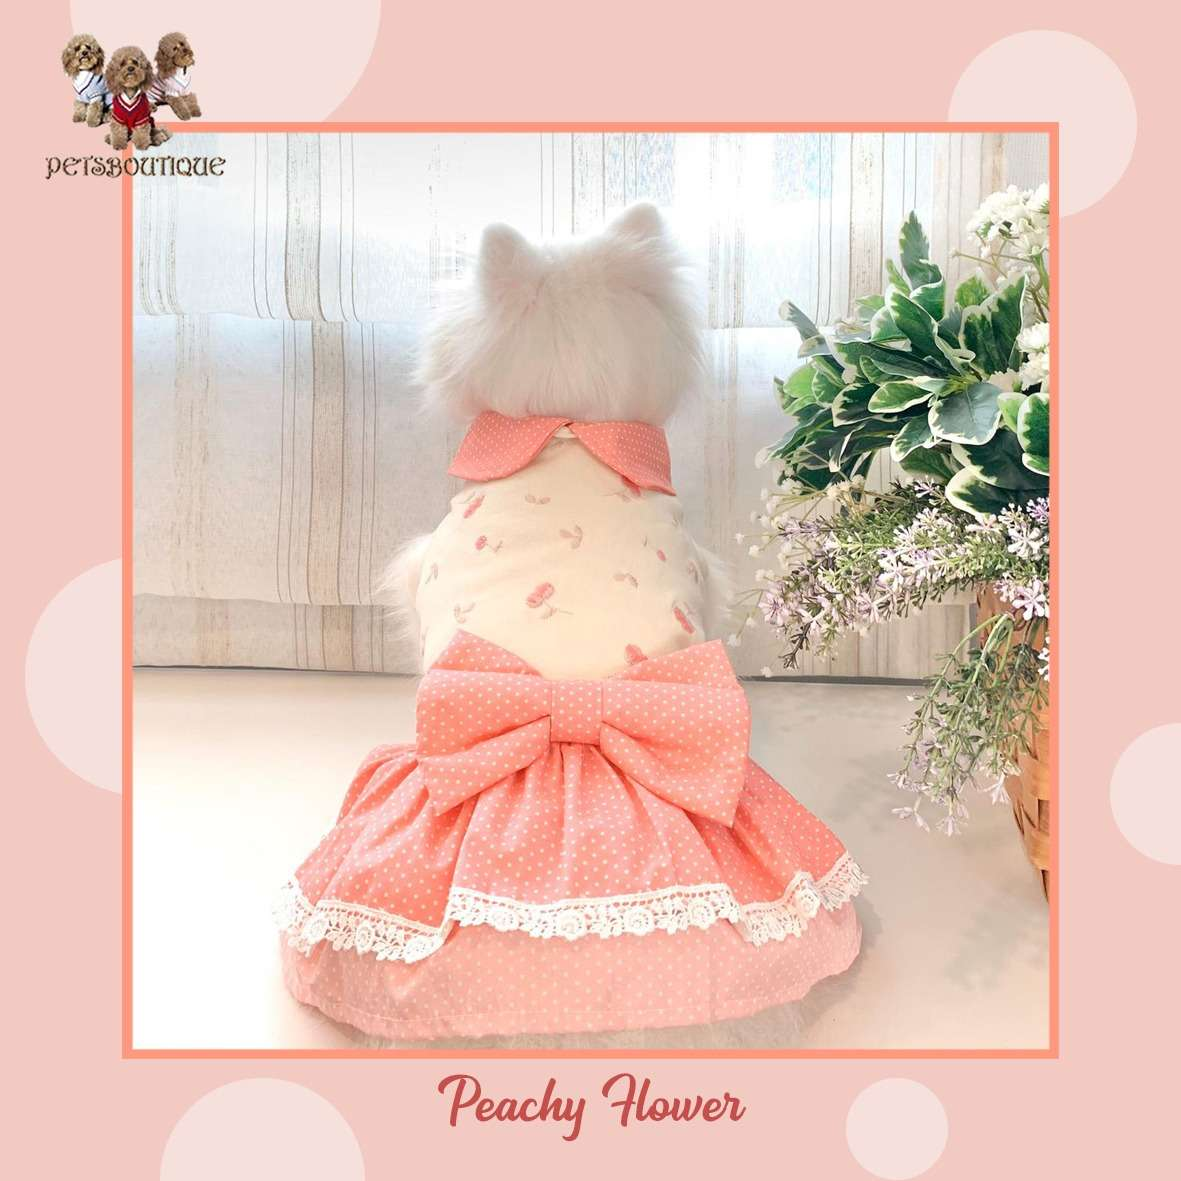 Animal Go Round - Peachy Flower Photo